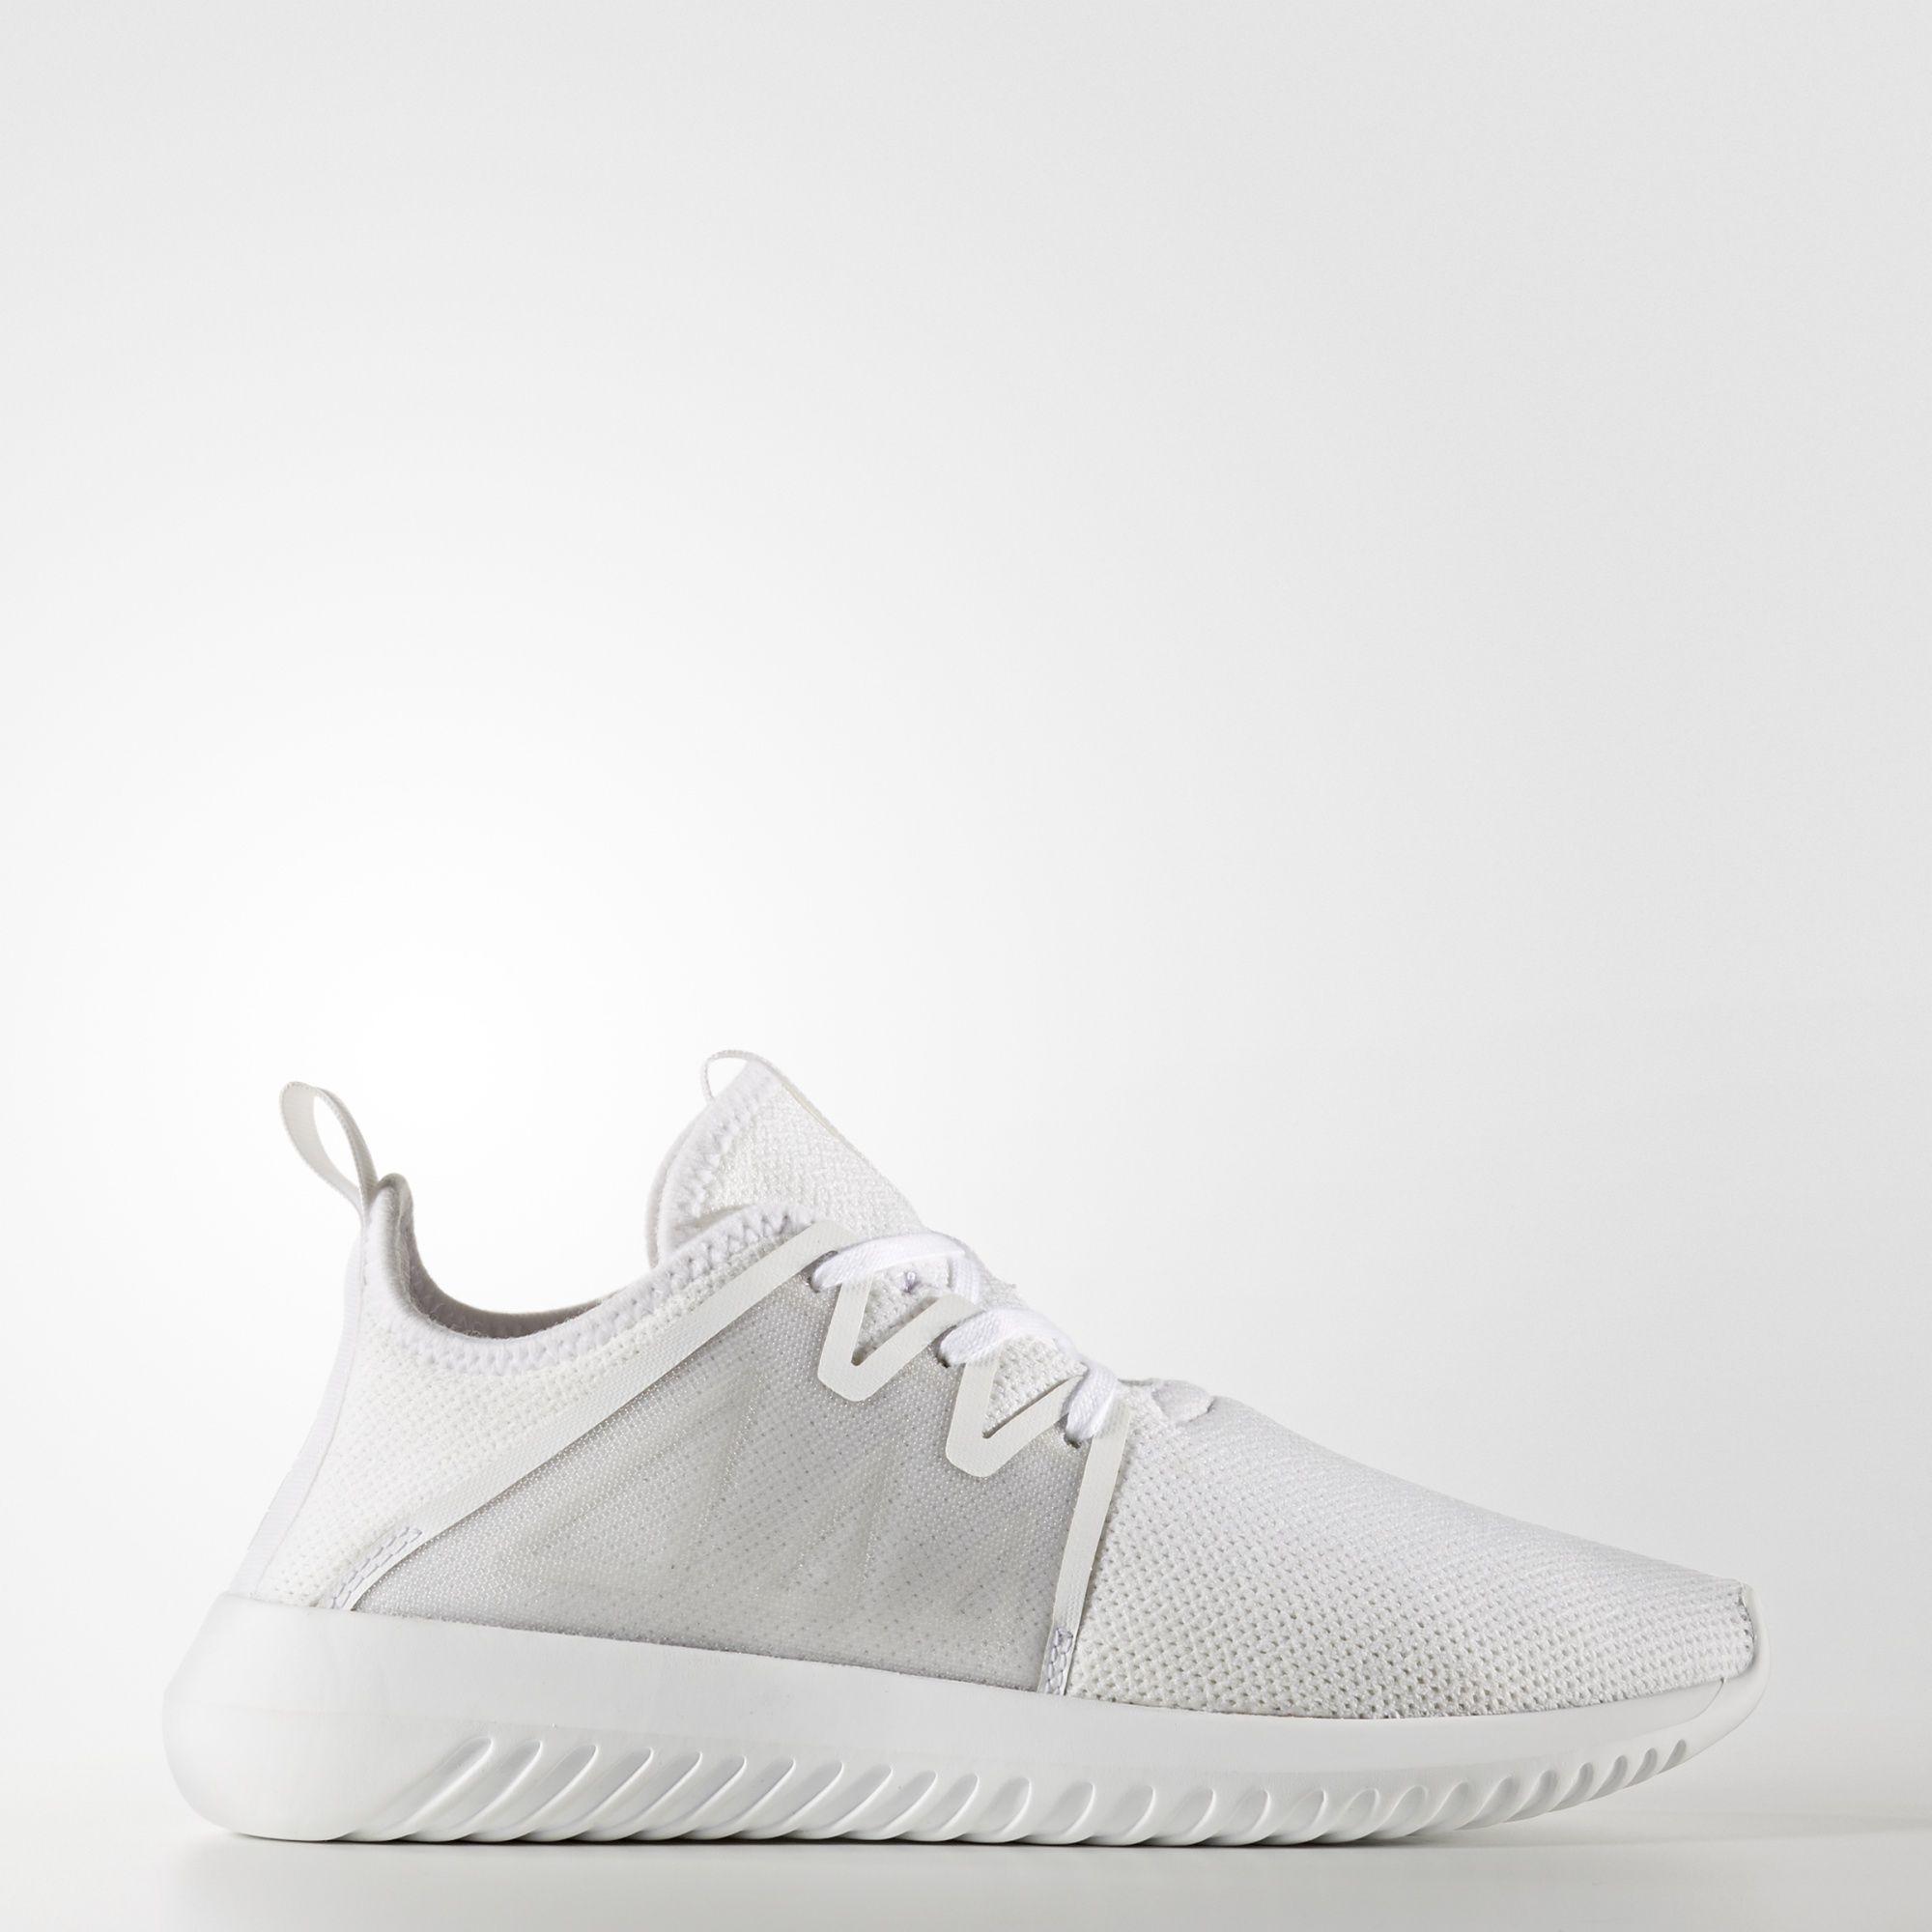 db3facadc8b1ef adidas - Tubular Viral 2.0 Shoes